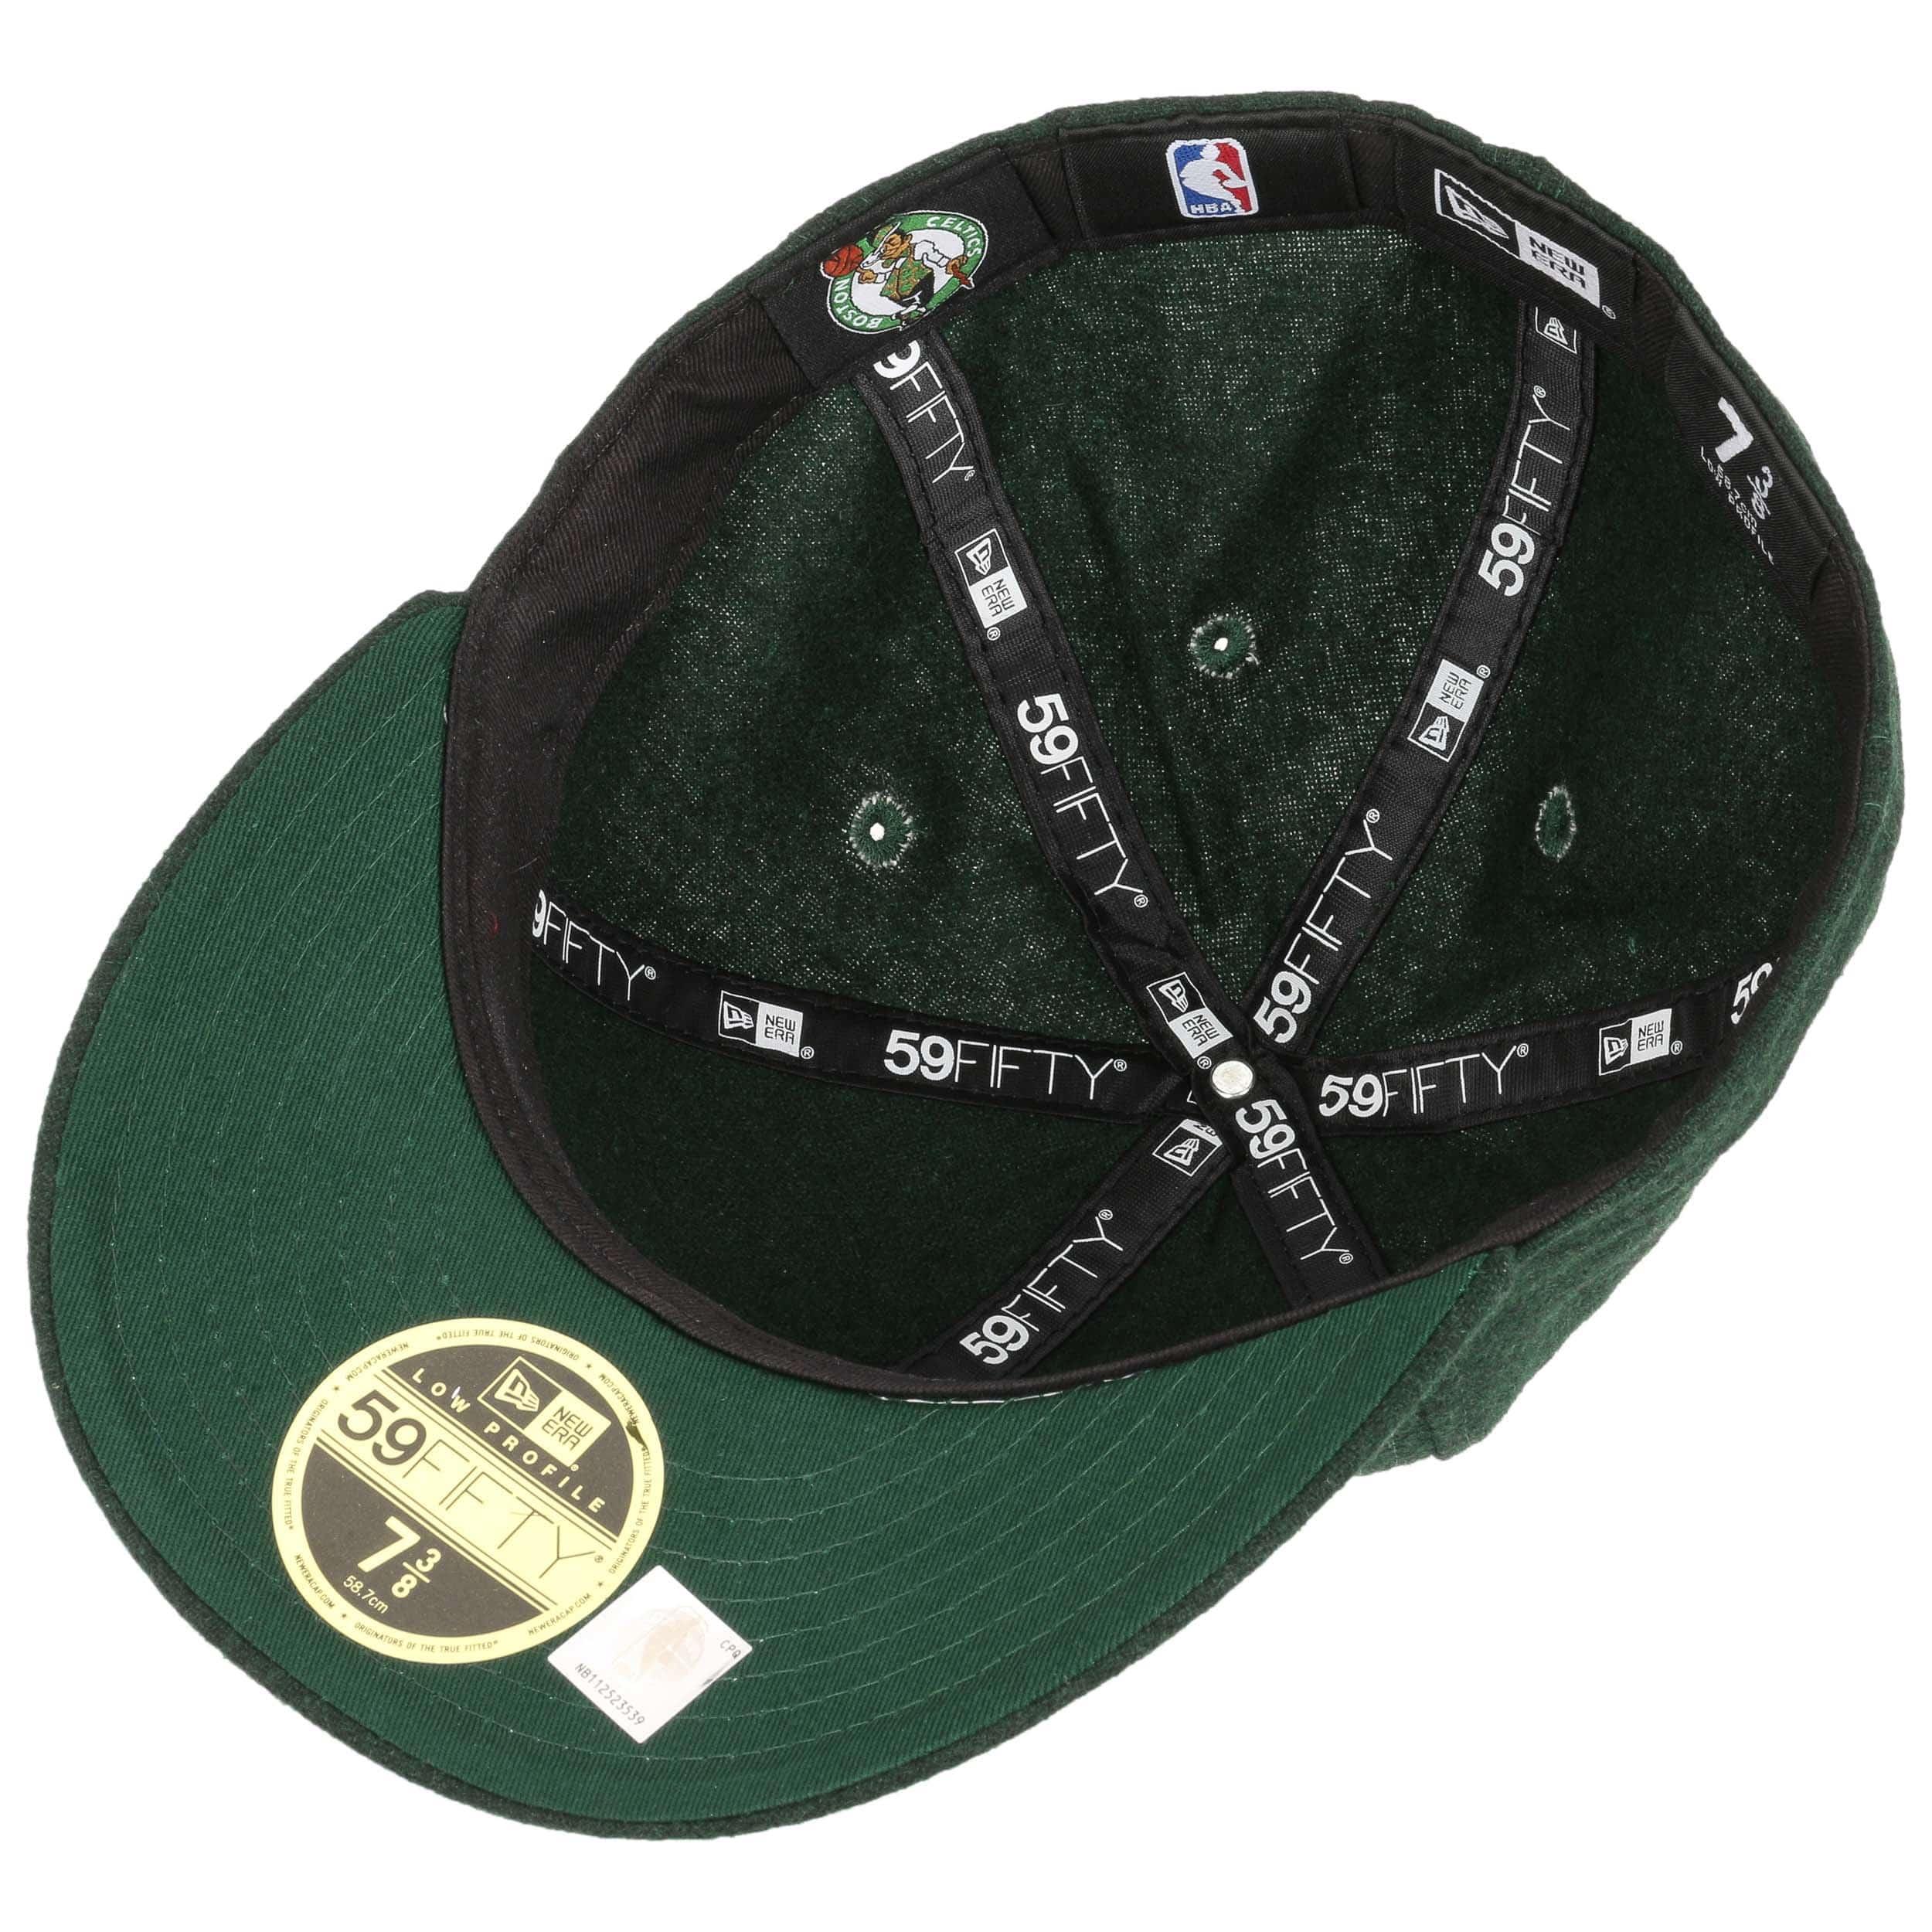 1a0f599888897c ... 59Fifty Low Profile Pin Celtics Cap by New Era - dark green 3 ...